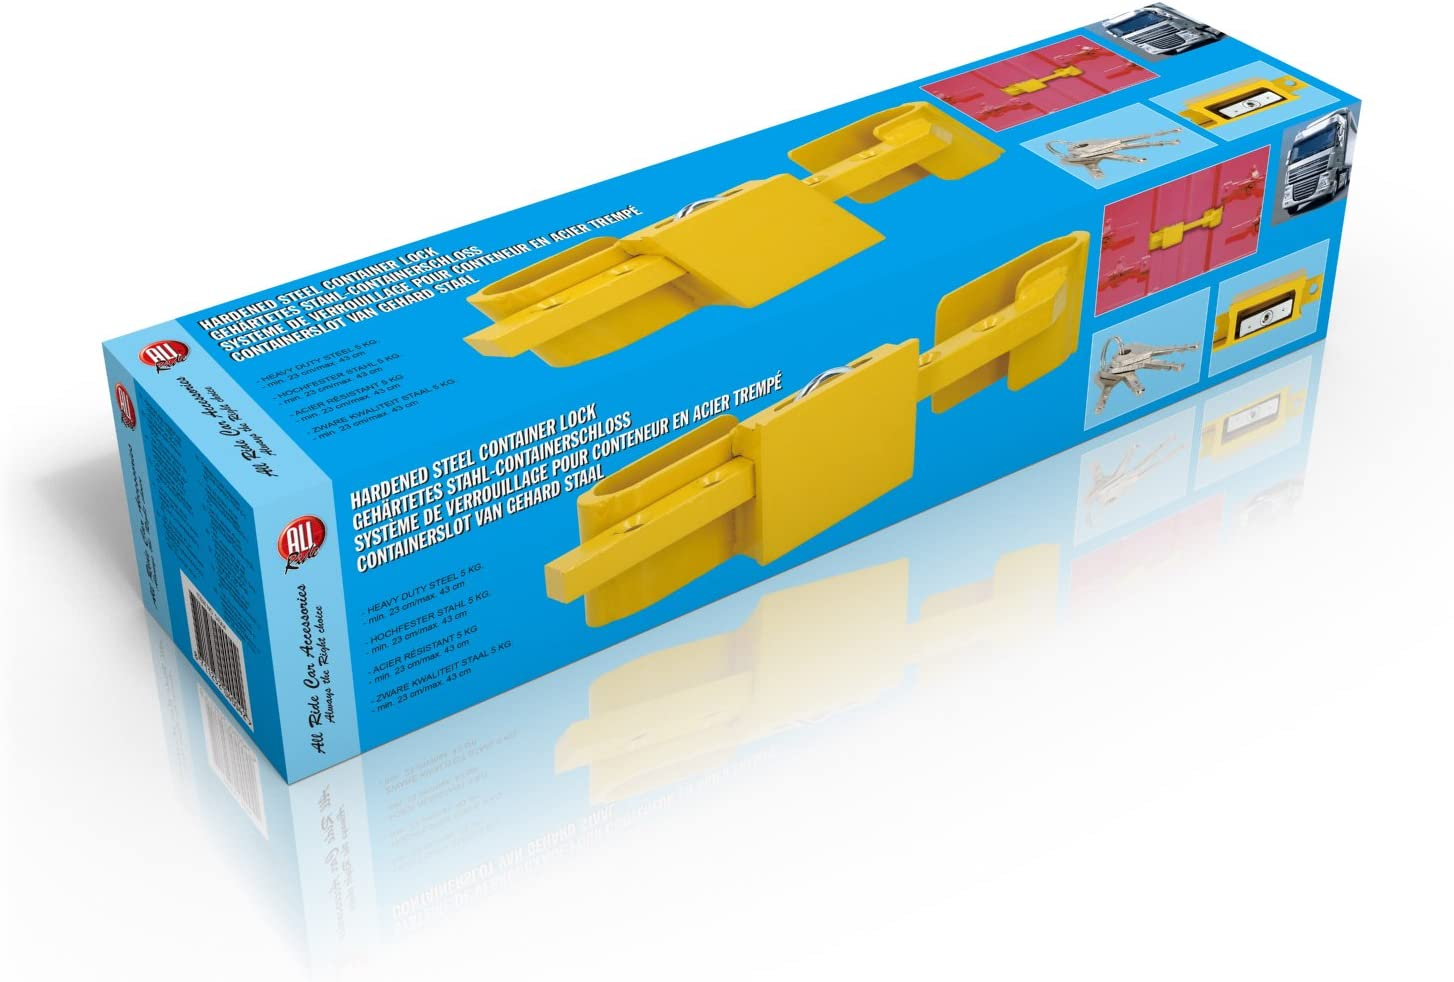 "Container Lock /â/€/"" Lorry Trailer lock High Security Door Lock /â/€/"" Hardened Steel /â/€/"" Security Grade Padlock /â/€/"" 4 Keys Included"